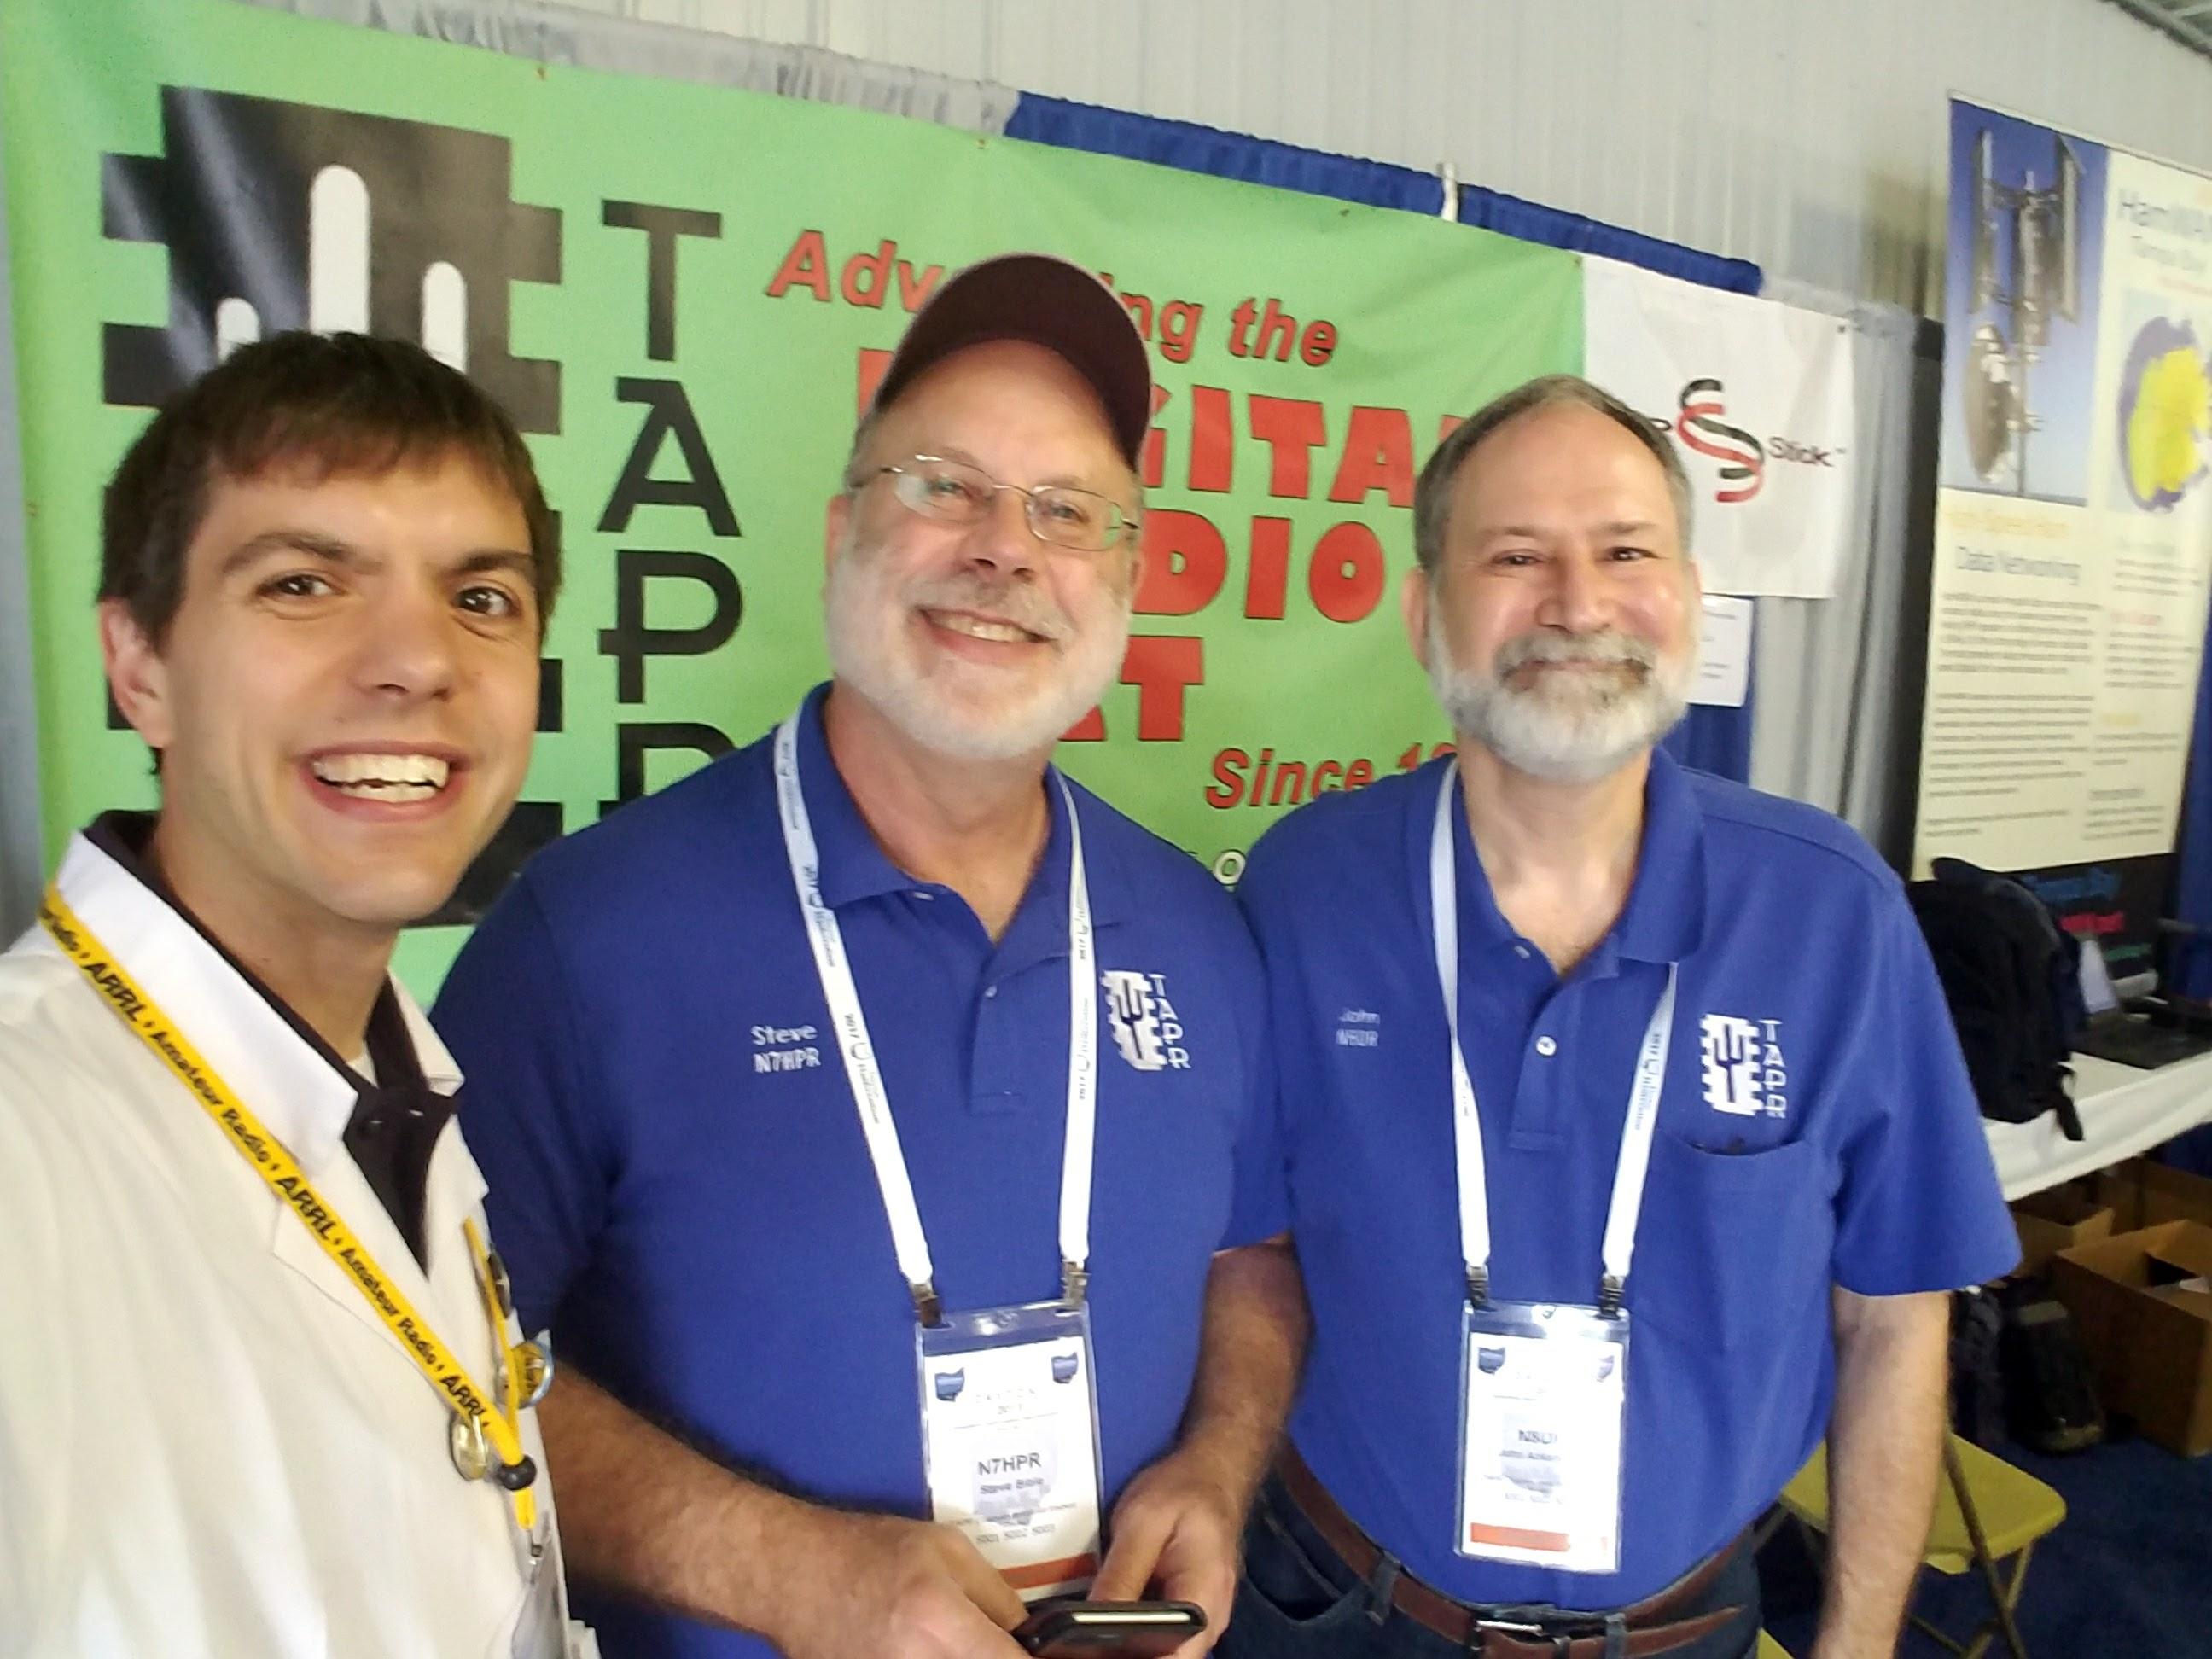 Nathaniel Frissell W2NAF, Steve Bible N7HPR, and John Ackermann N8UR